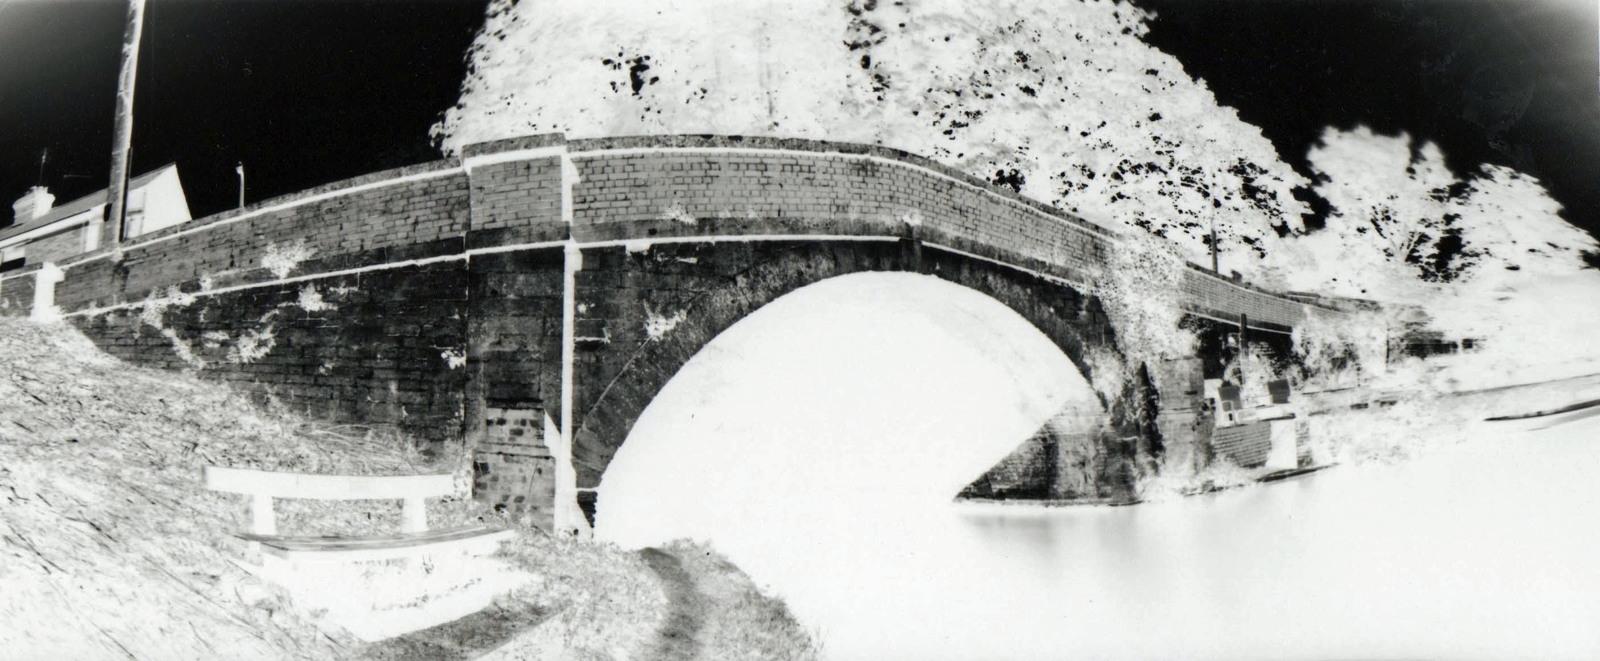 3. Ryeford Bridge, Stonehouse